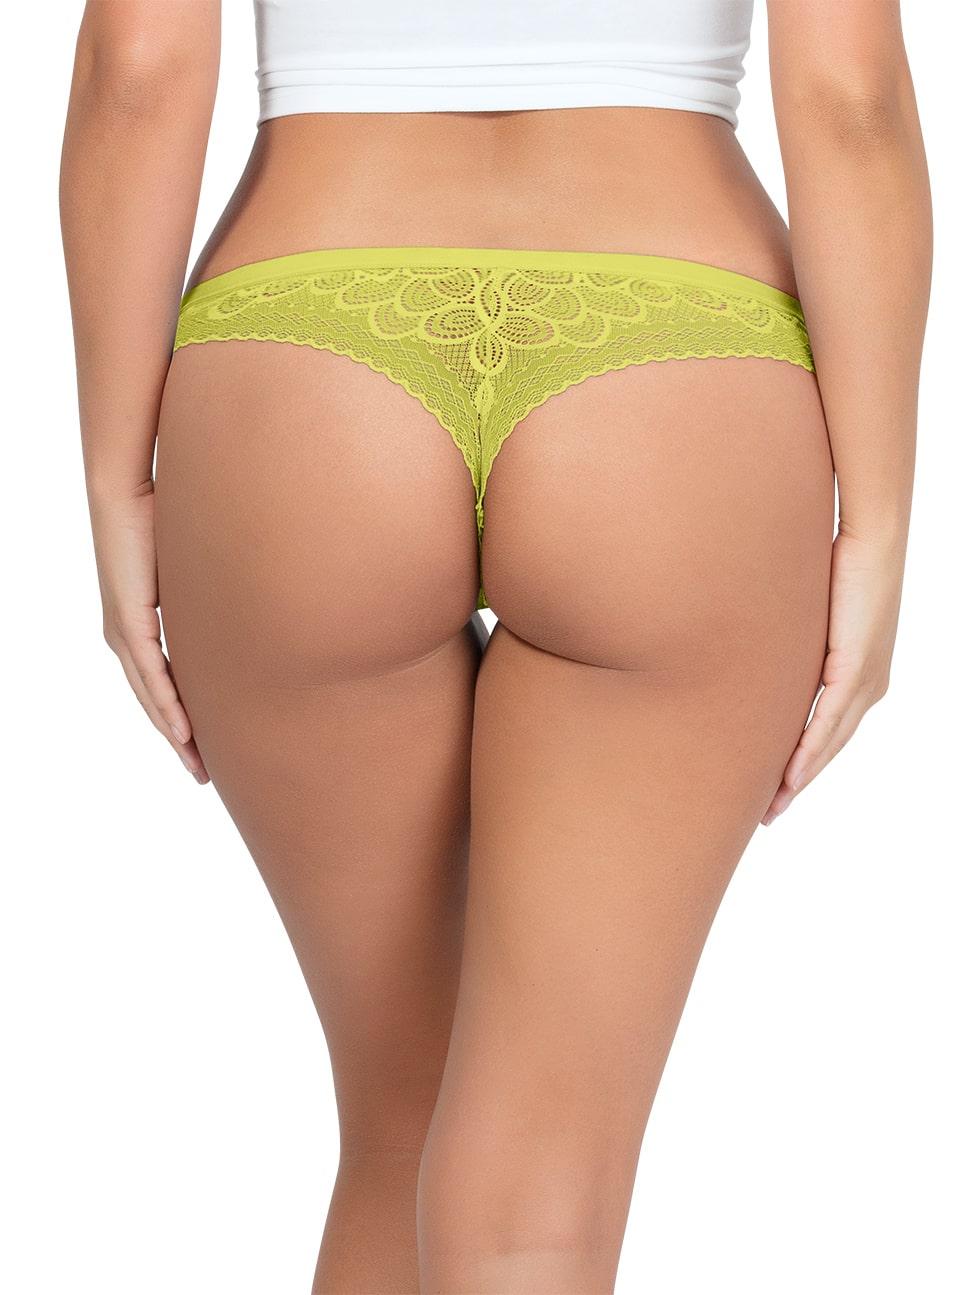 ParfaitPanty SoGlam ThongPP402 Lemonade Back - Parfait Panty So Glam Thong - Lemonade - PP402